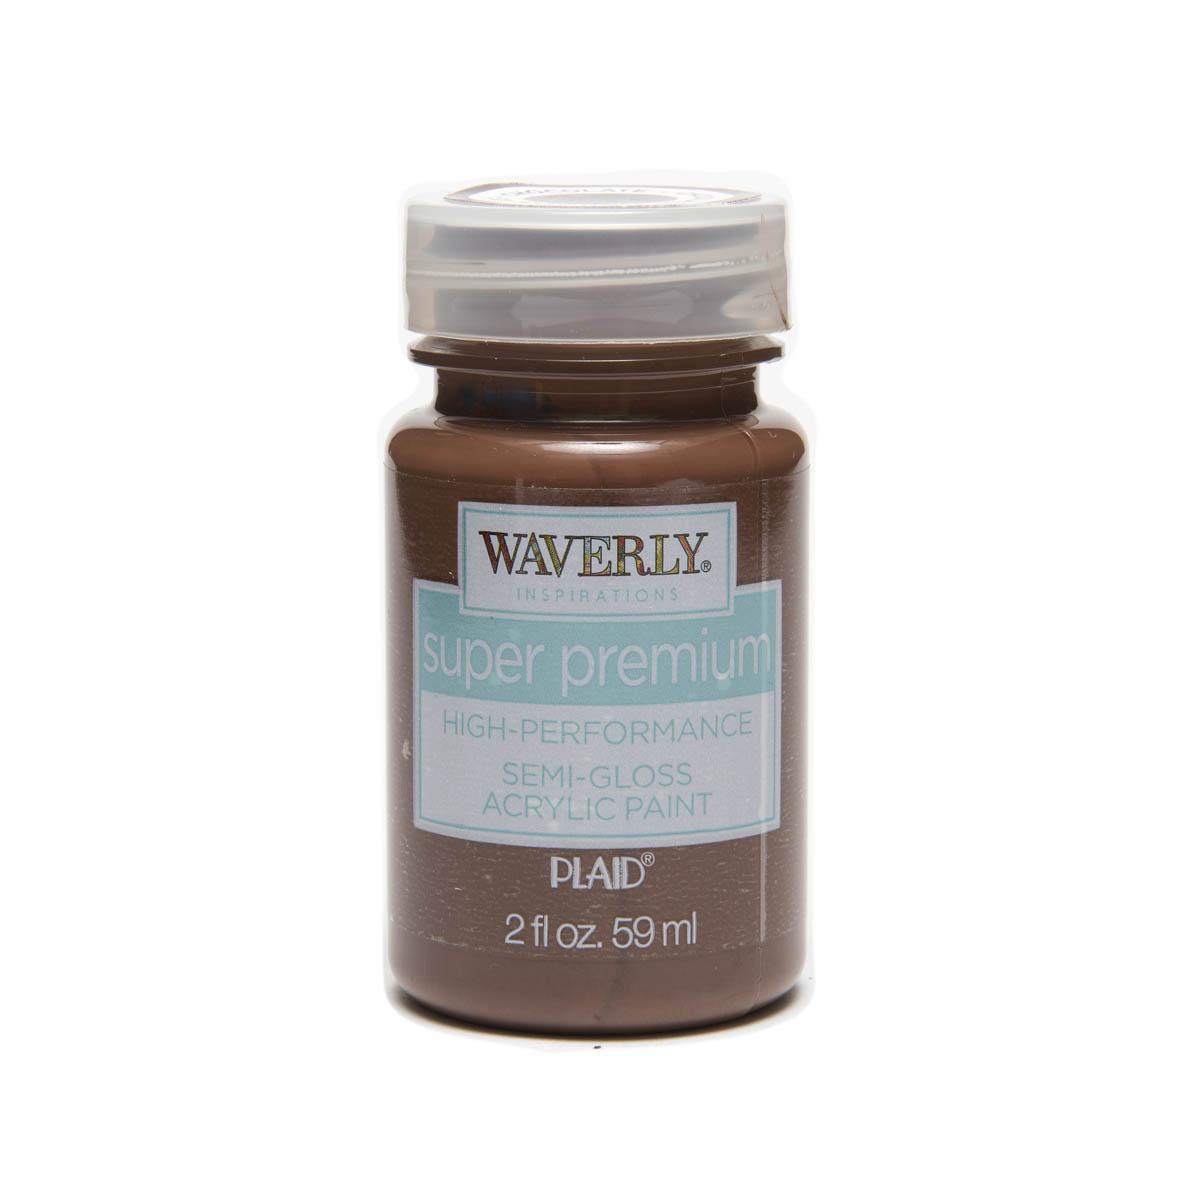 Waverly ® Inspirations Super Premium Semi-Gloss Acrylic Paint - Chocolate, 2 oz. - 60653E